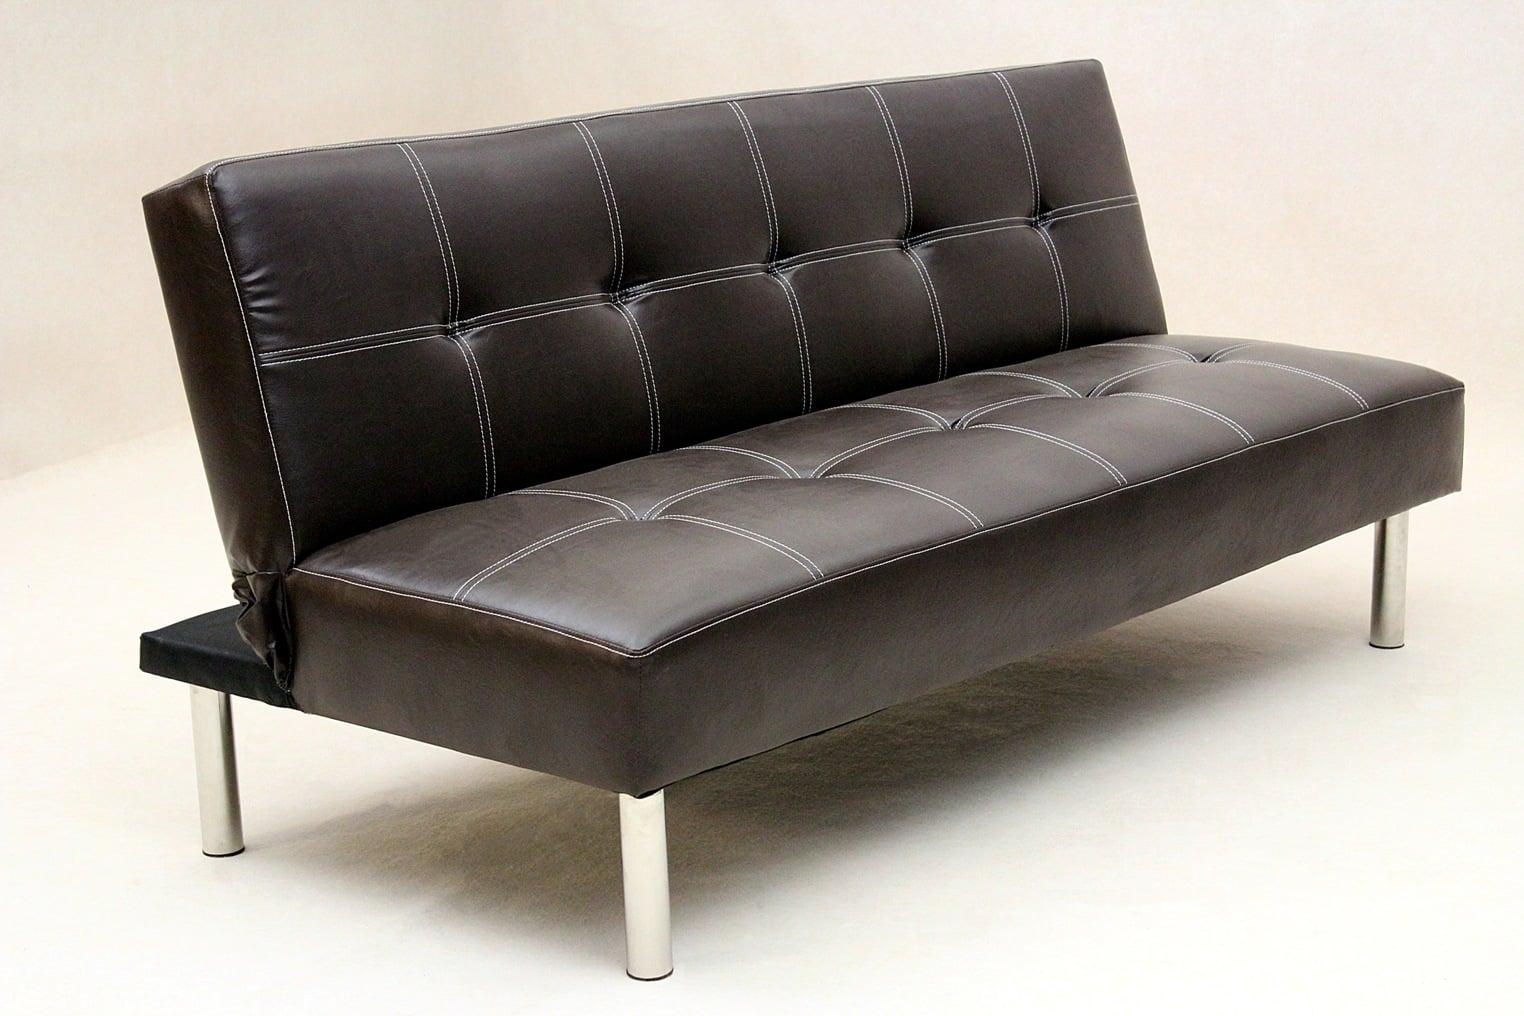 Venus 3 Seater Sofa Bed